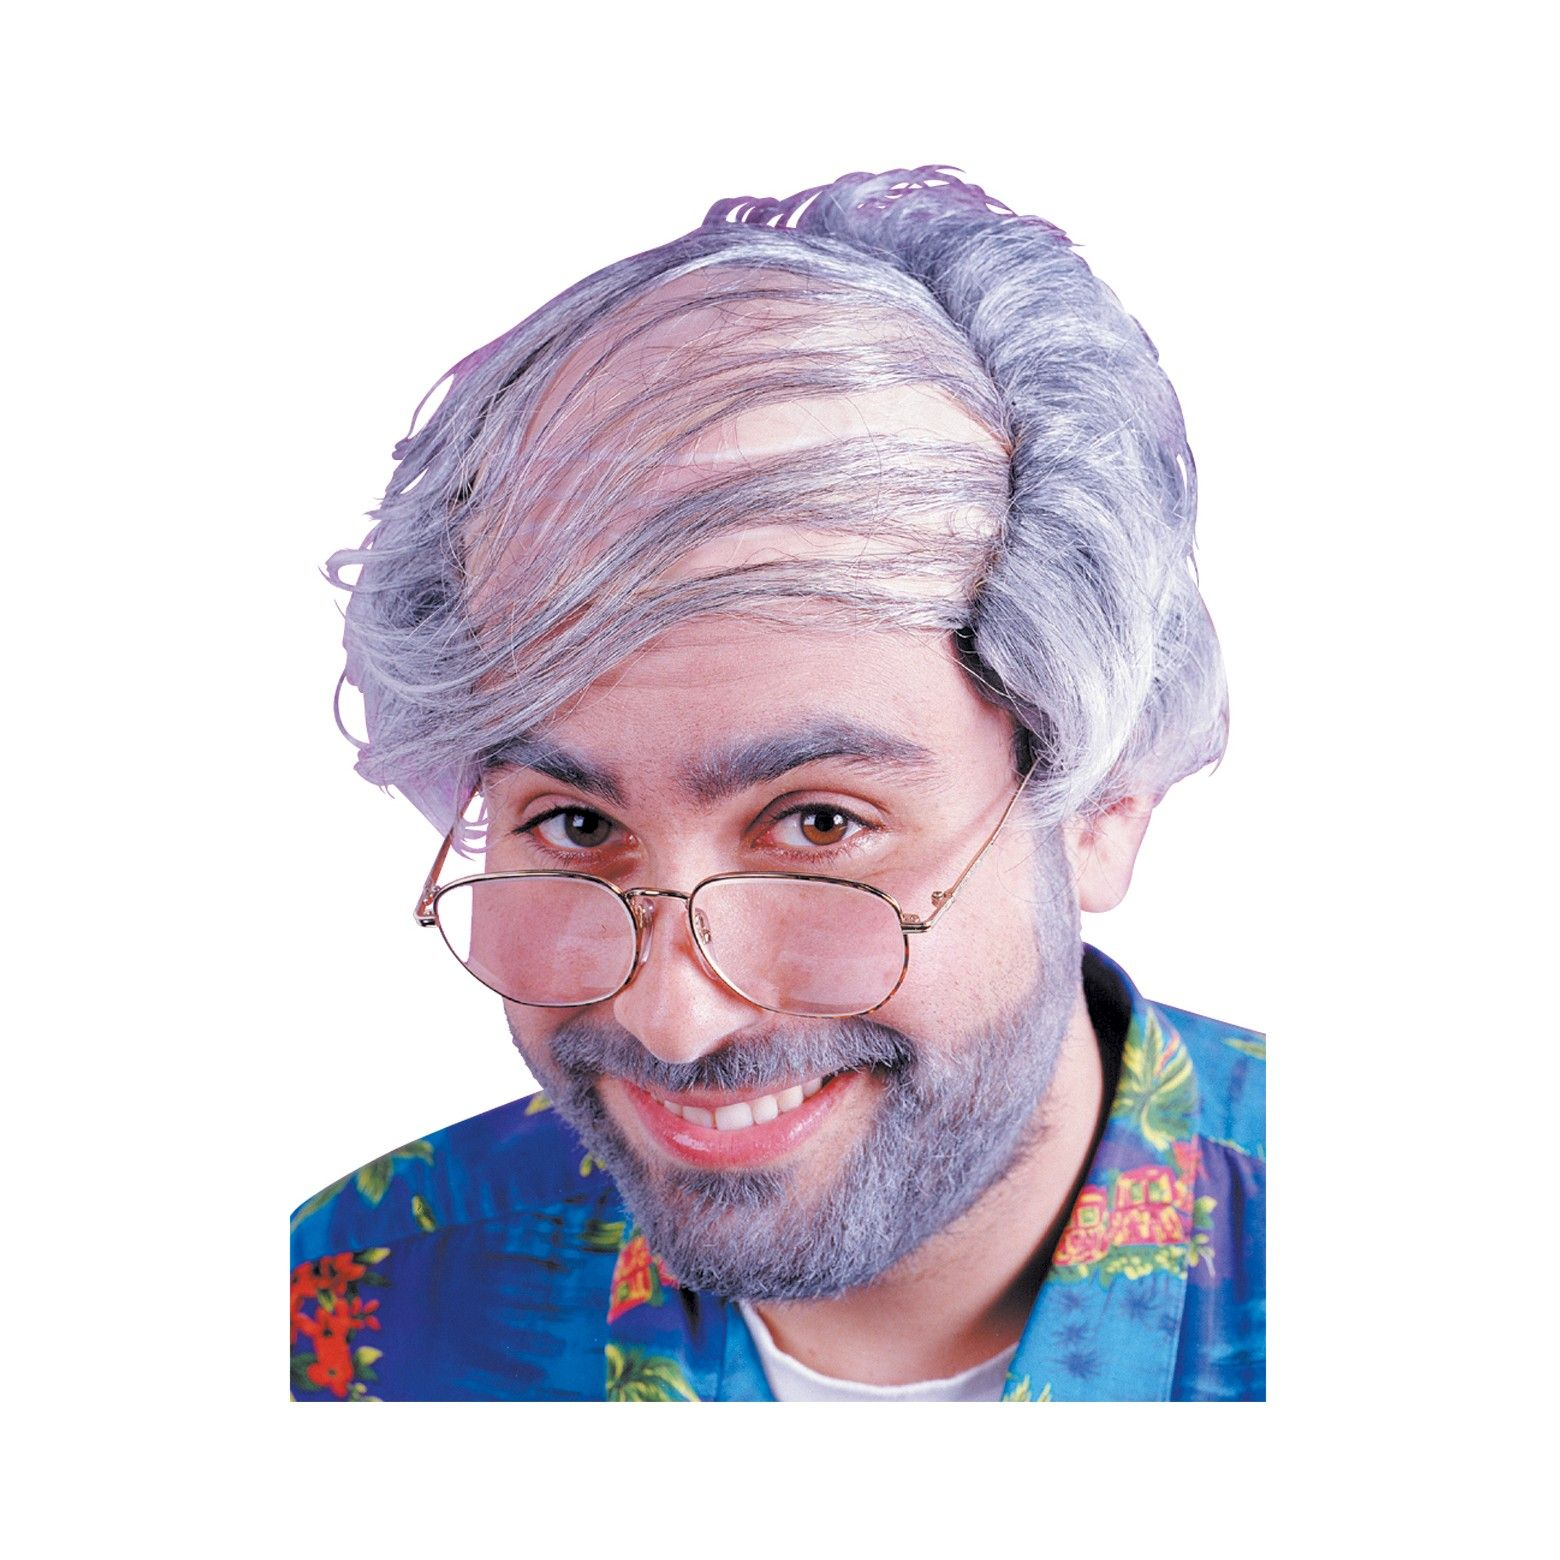 Halloween Comb Over Costume Wig Menu0027s Multi-Colored  sc 1 st  Pinterest & Comb Over Costume Wig   Halloween   Pinterest   Costume wigs and ...